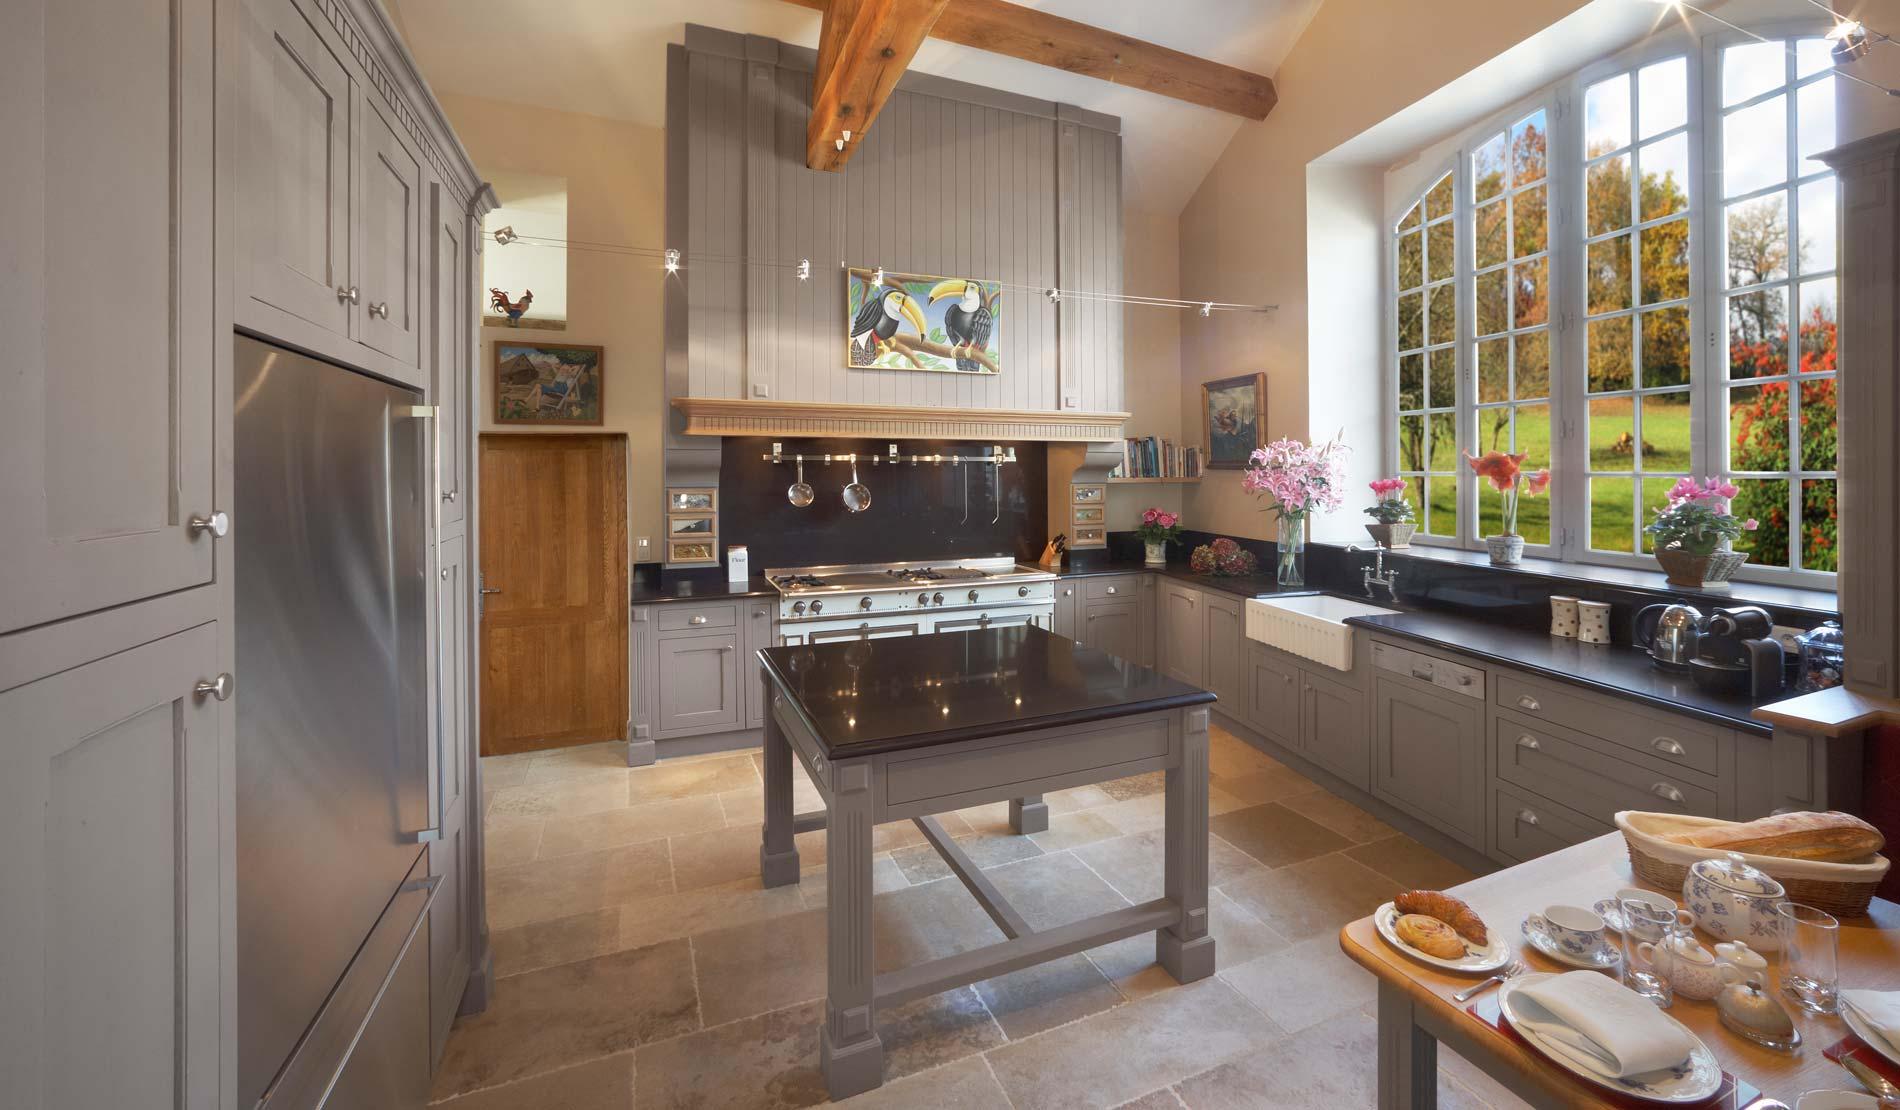 cuisiniste toulouse cuisiniste toulouse dotti design. Black Bedroom Furniture Sets. Home Design Ideas